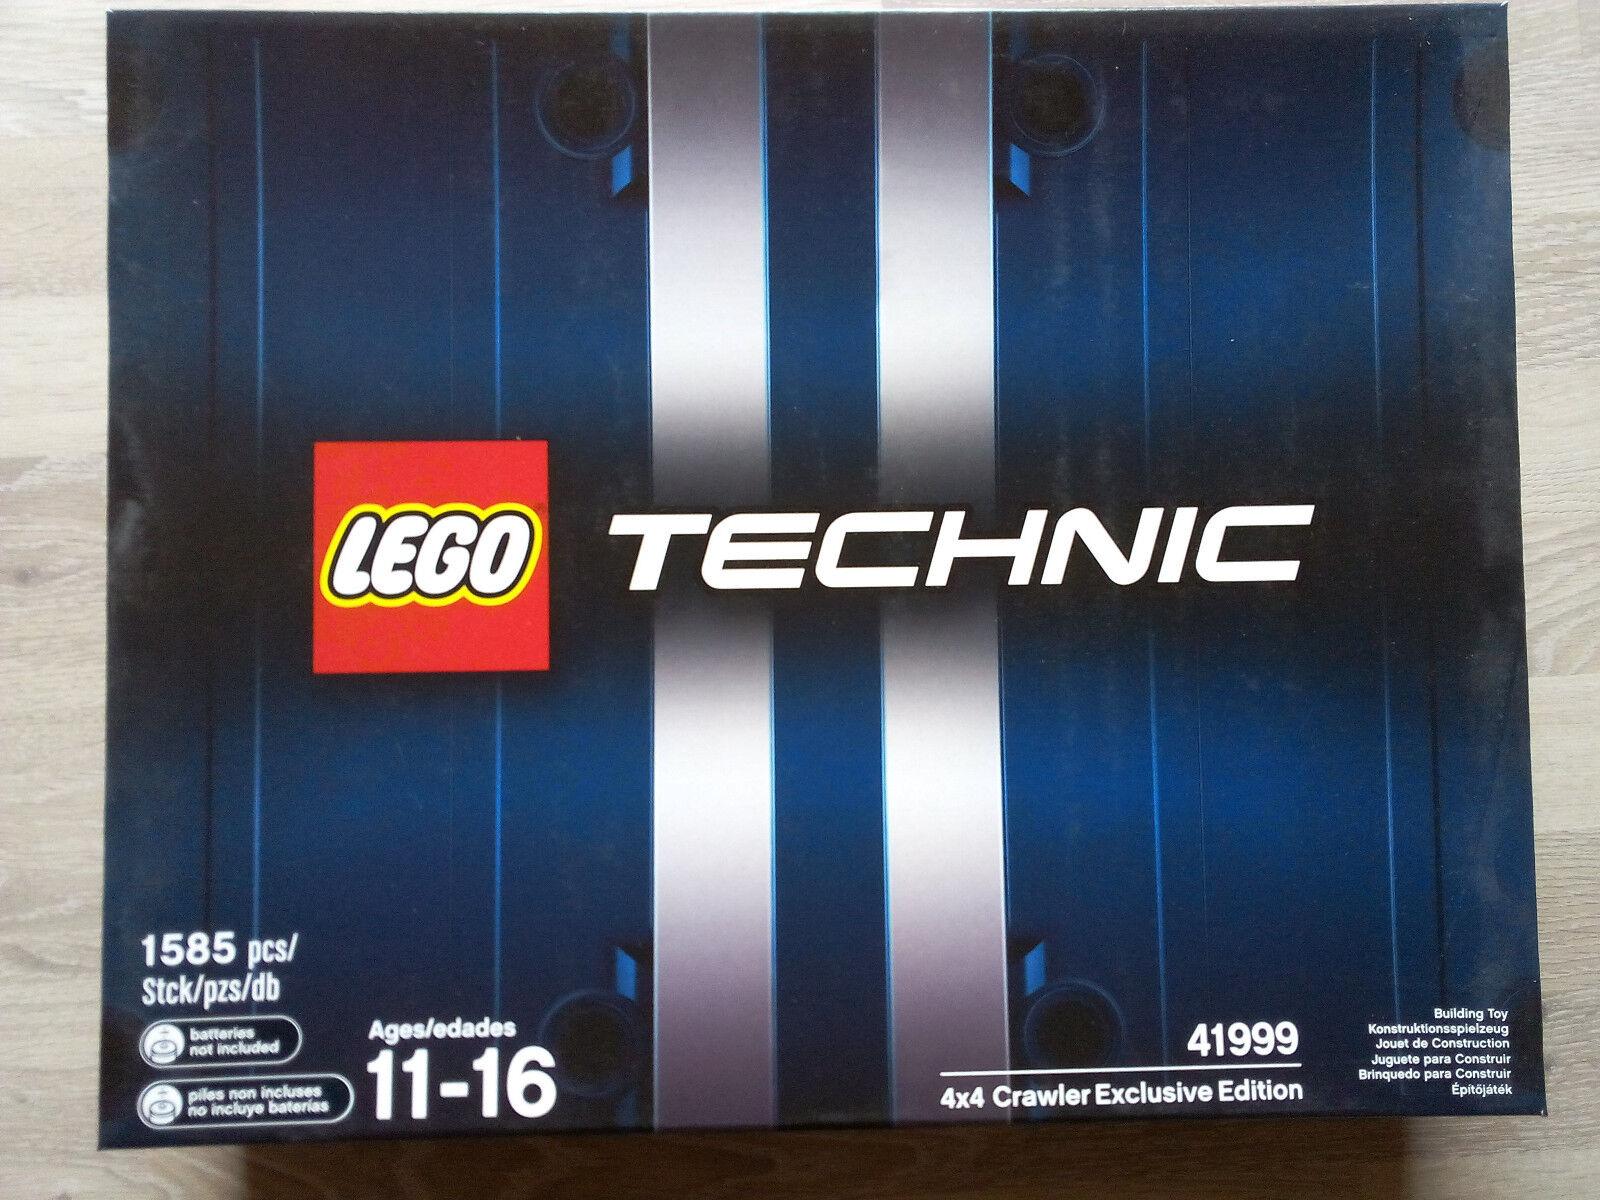 Lego Technic 41999 Exclusive Edition 4x4 Crawler / / / NEU & OVP - UNGEÖFFNET ac57bf